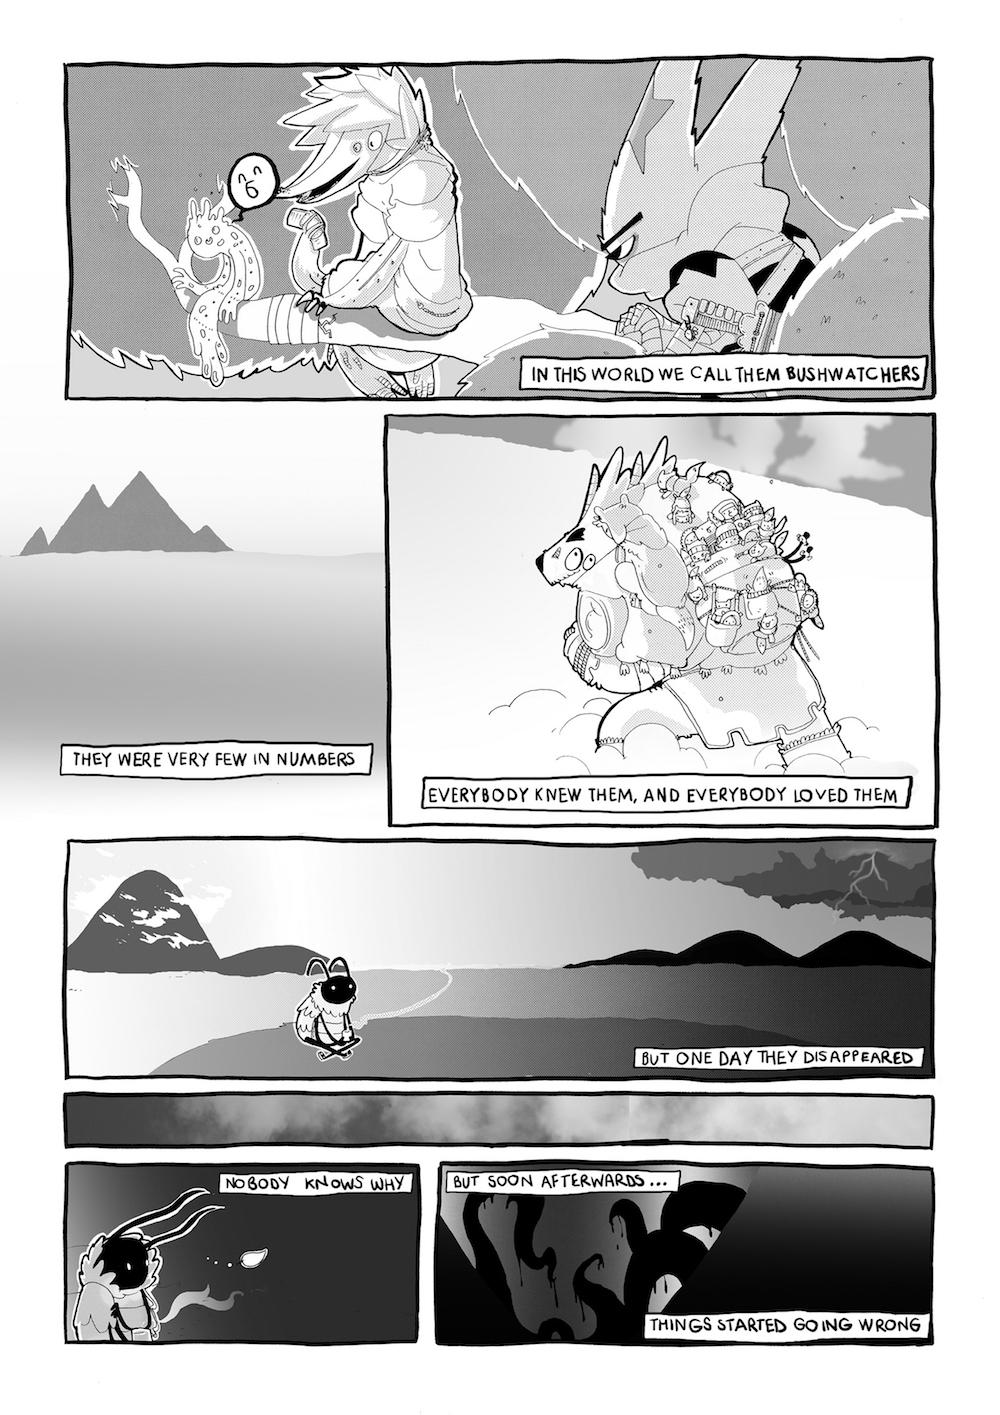 herald owlett vol 1 page 2 copy.jpg